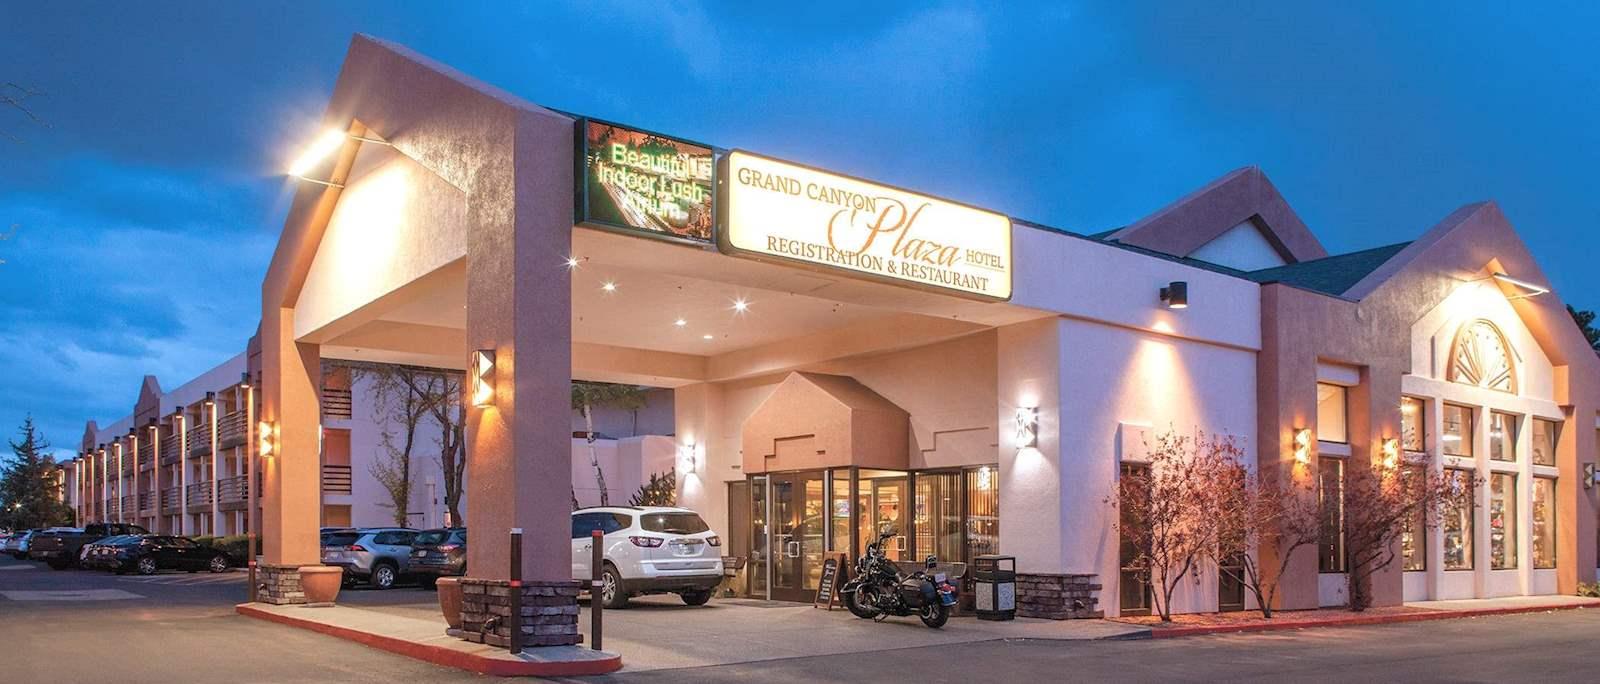 Grand Canyon Plaza Hotel, Tusayan, Arizona